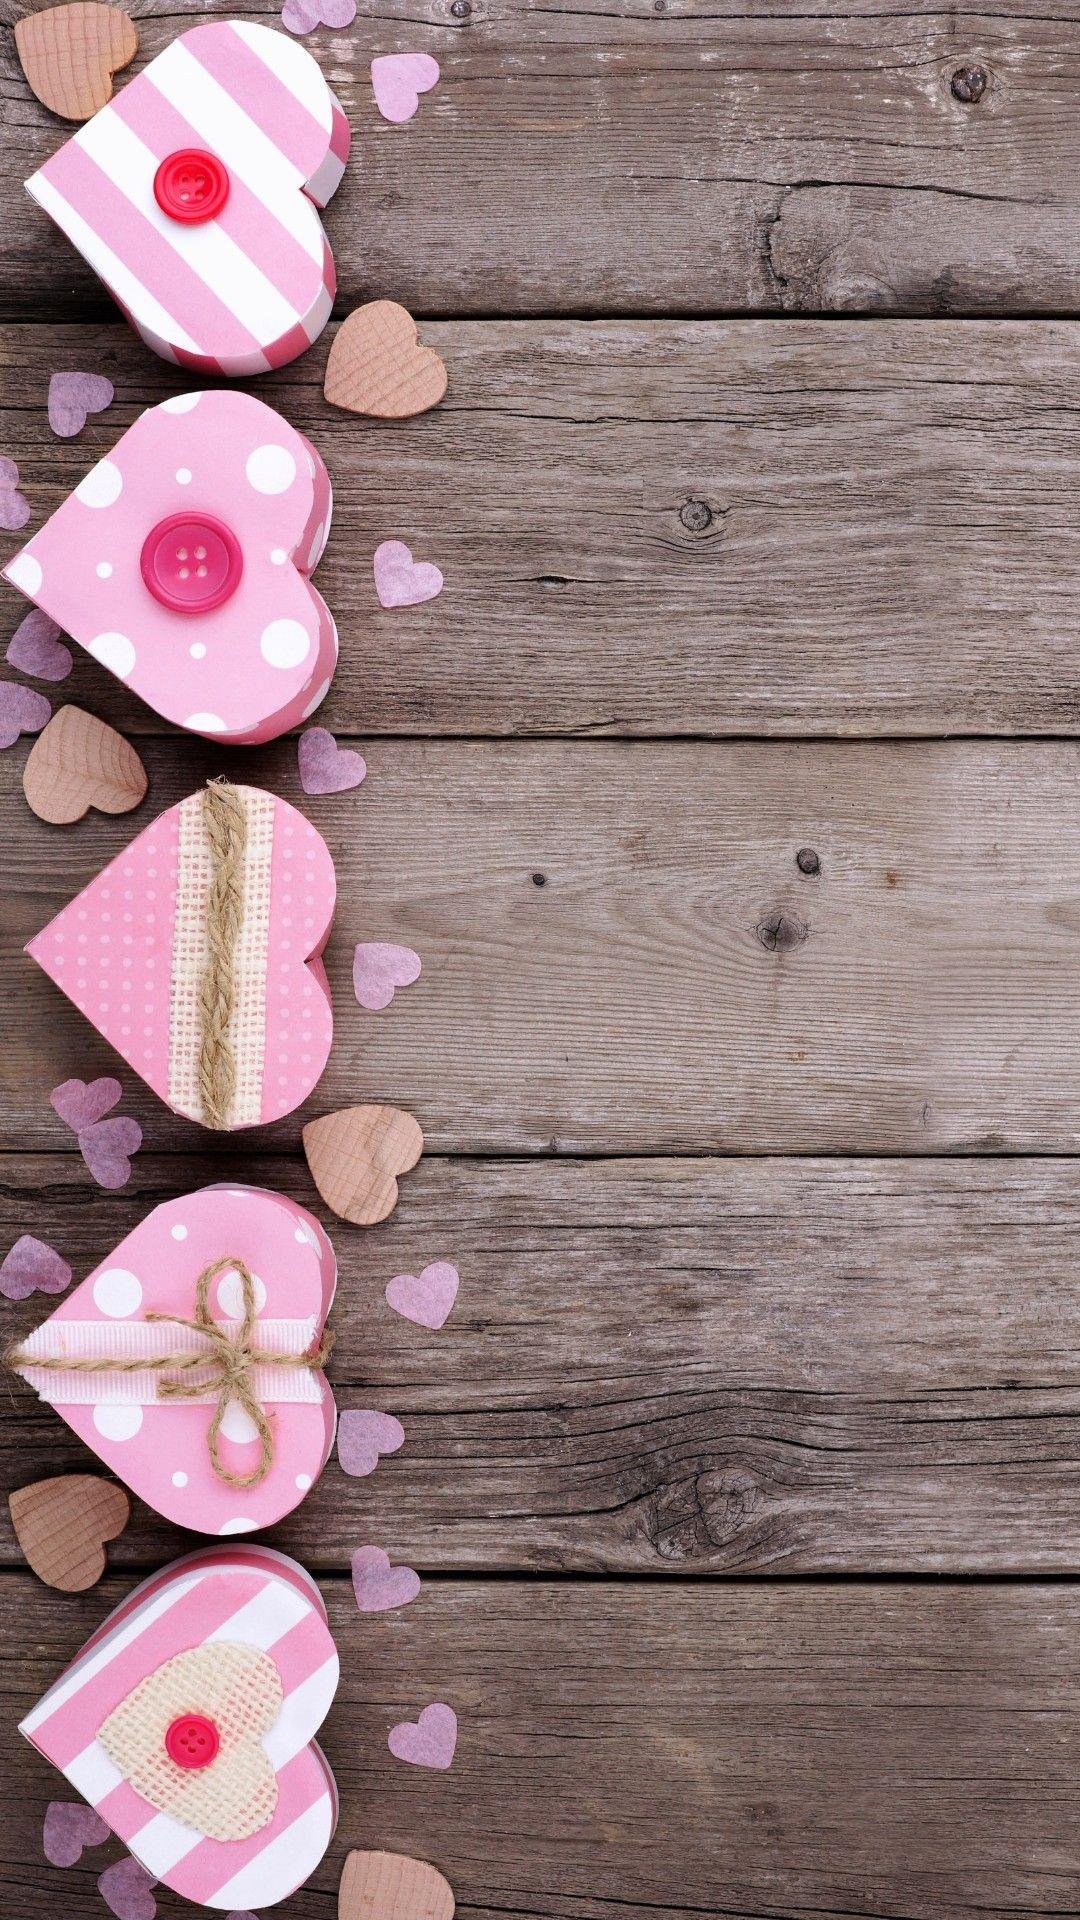 Valentine's Day/scrapbooking Valentines wallpaper iphone